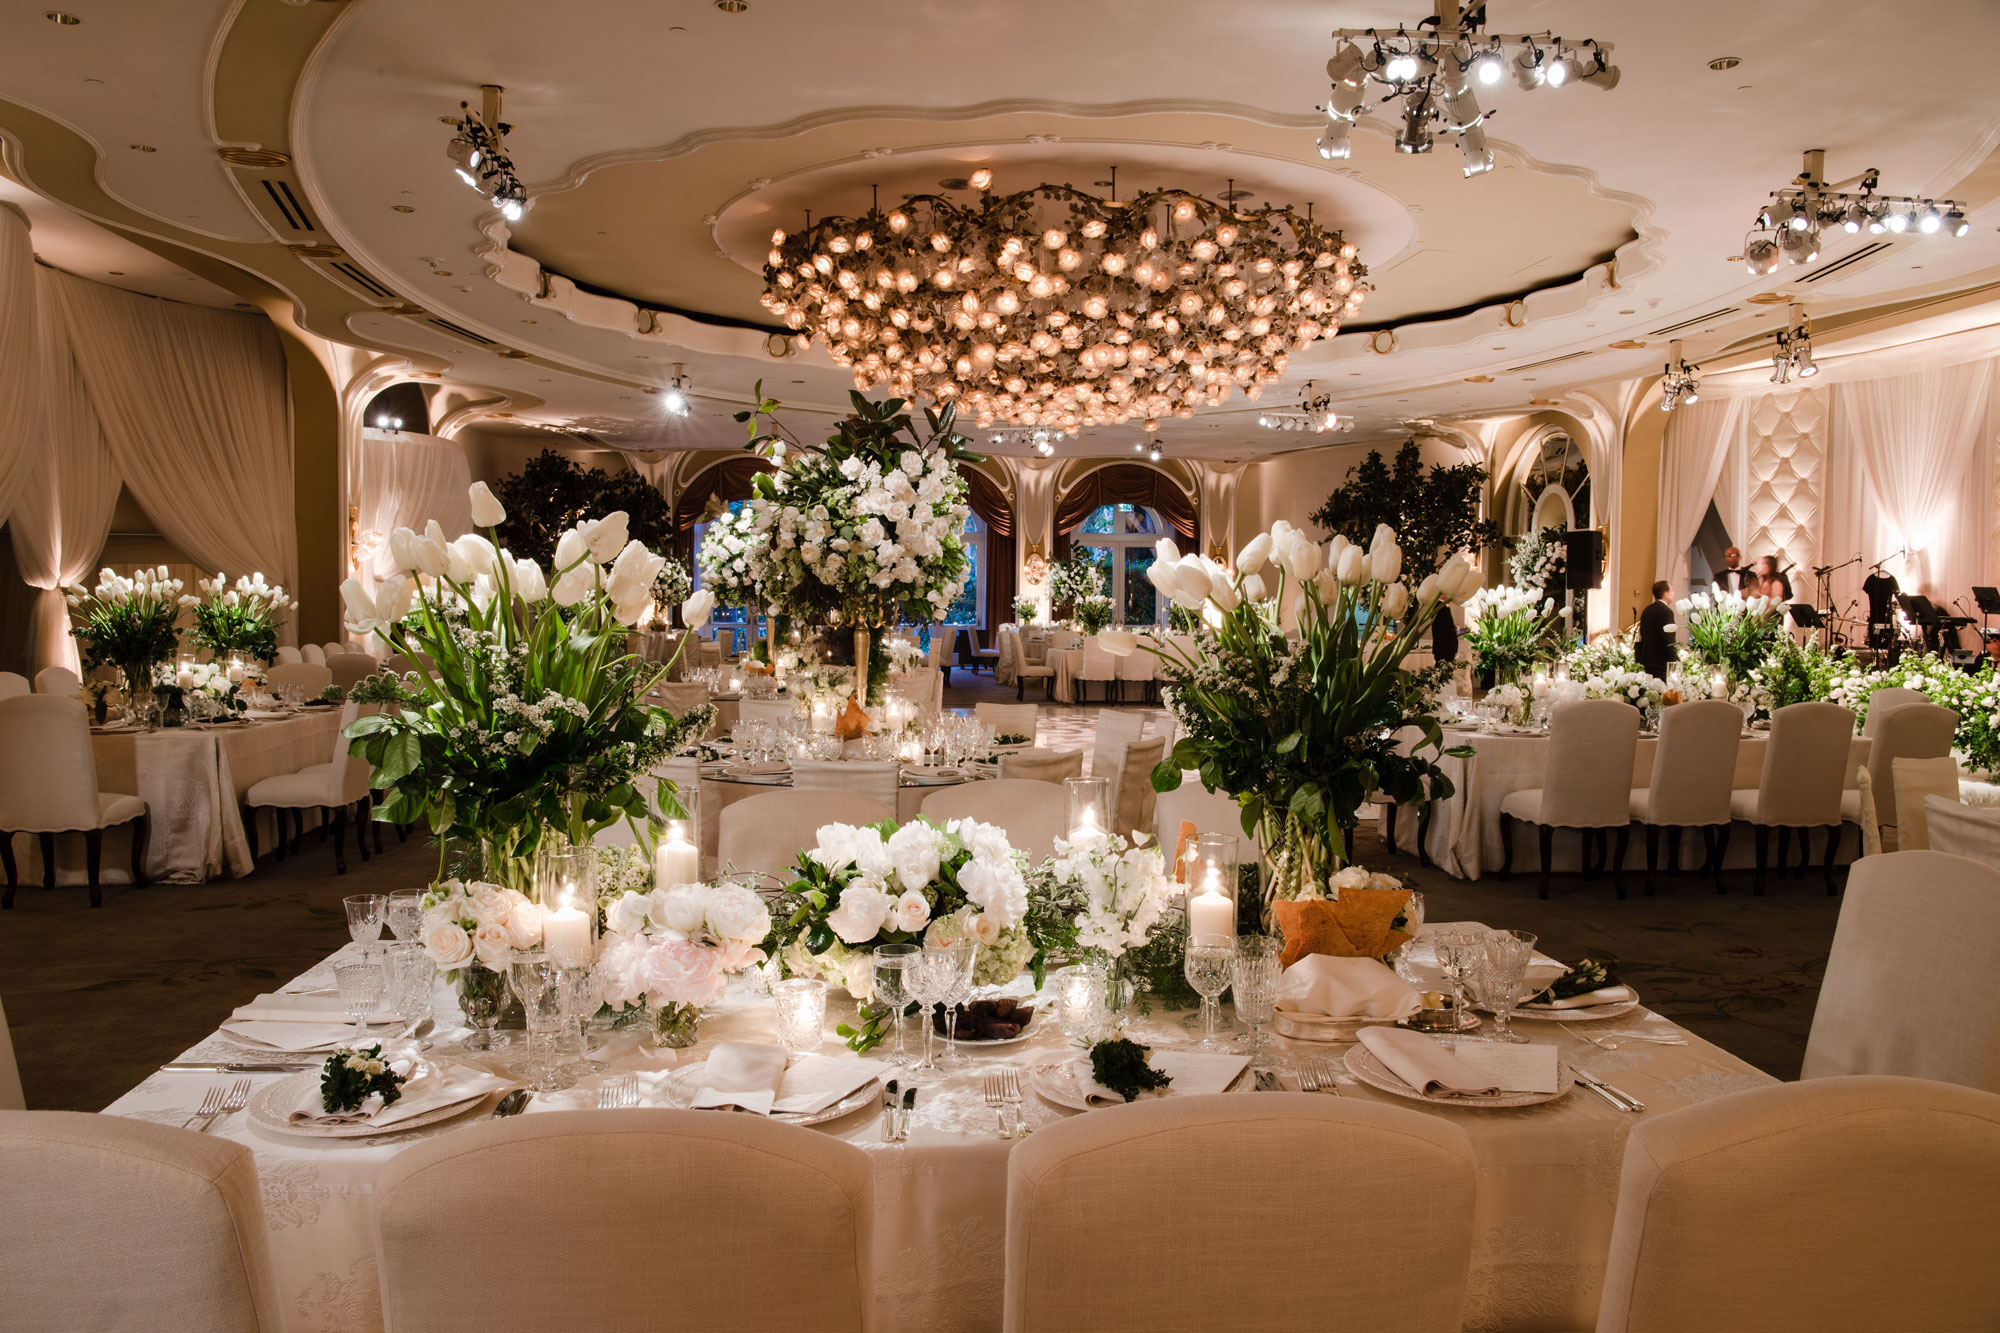 Inside Weddings Spring 2017 issue ballroom wedding Levine Fox Events beverly hills